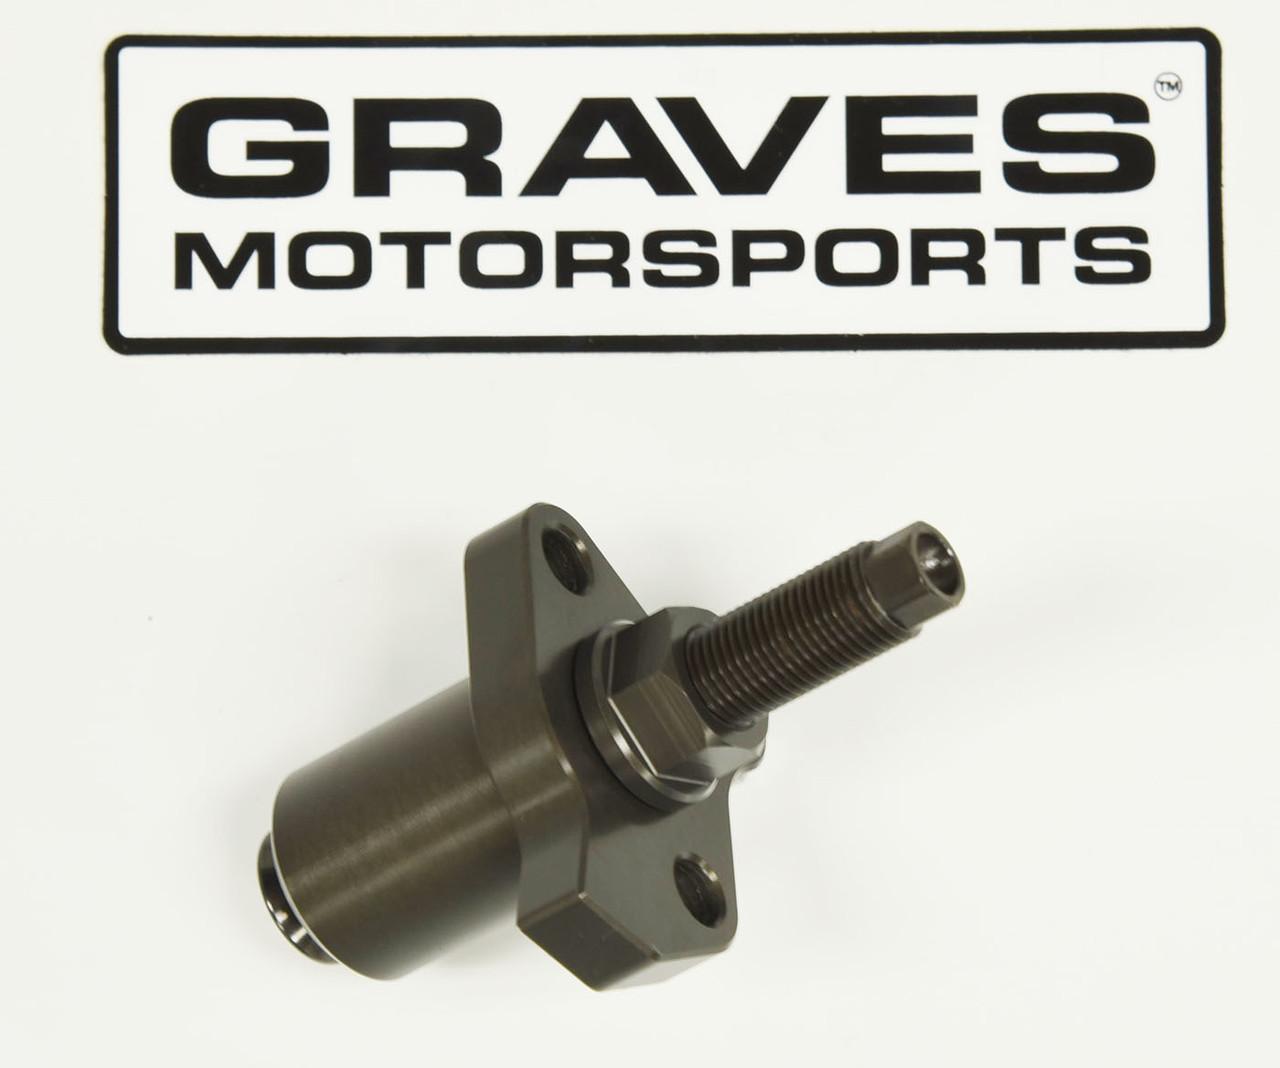 Graves Motorsports Aprilia Rsv4 Tuono Carbon Exhaust